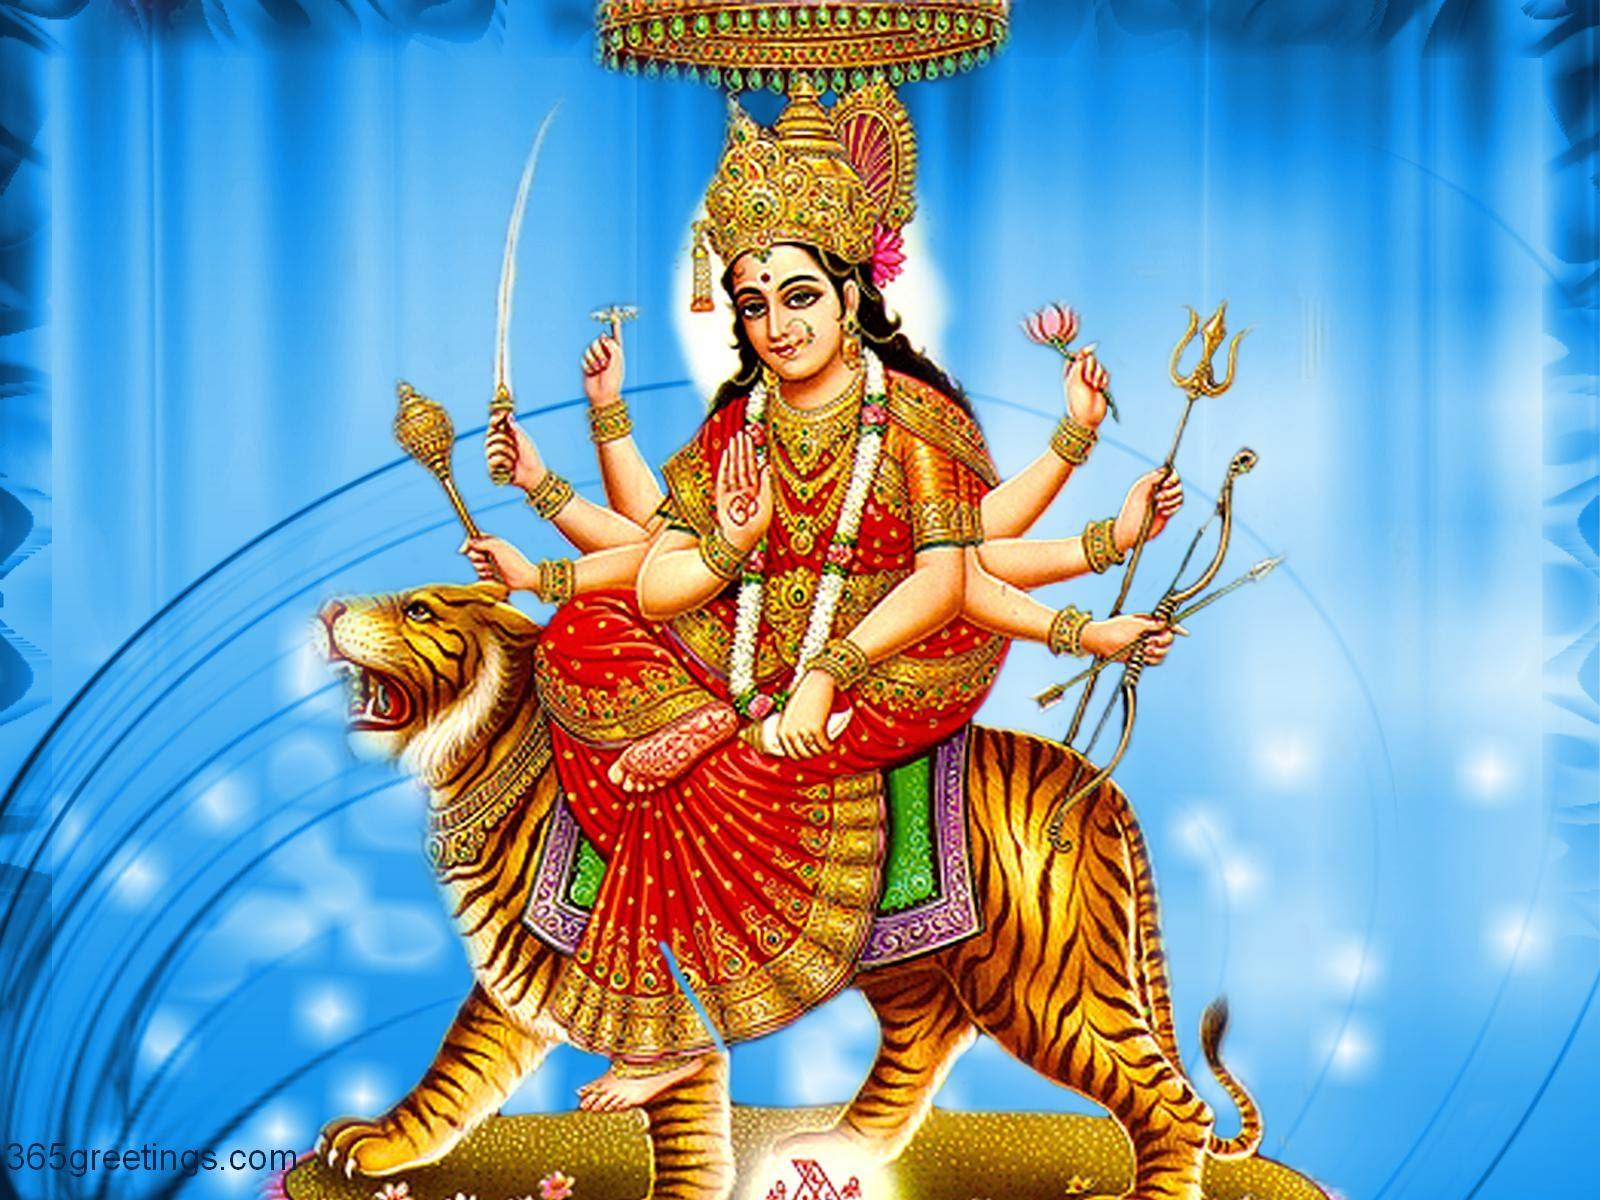 Jai Maa Lakshmi | Durga goddess, Hindu gods, Lakshmi images